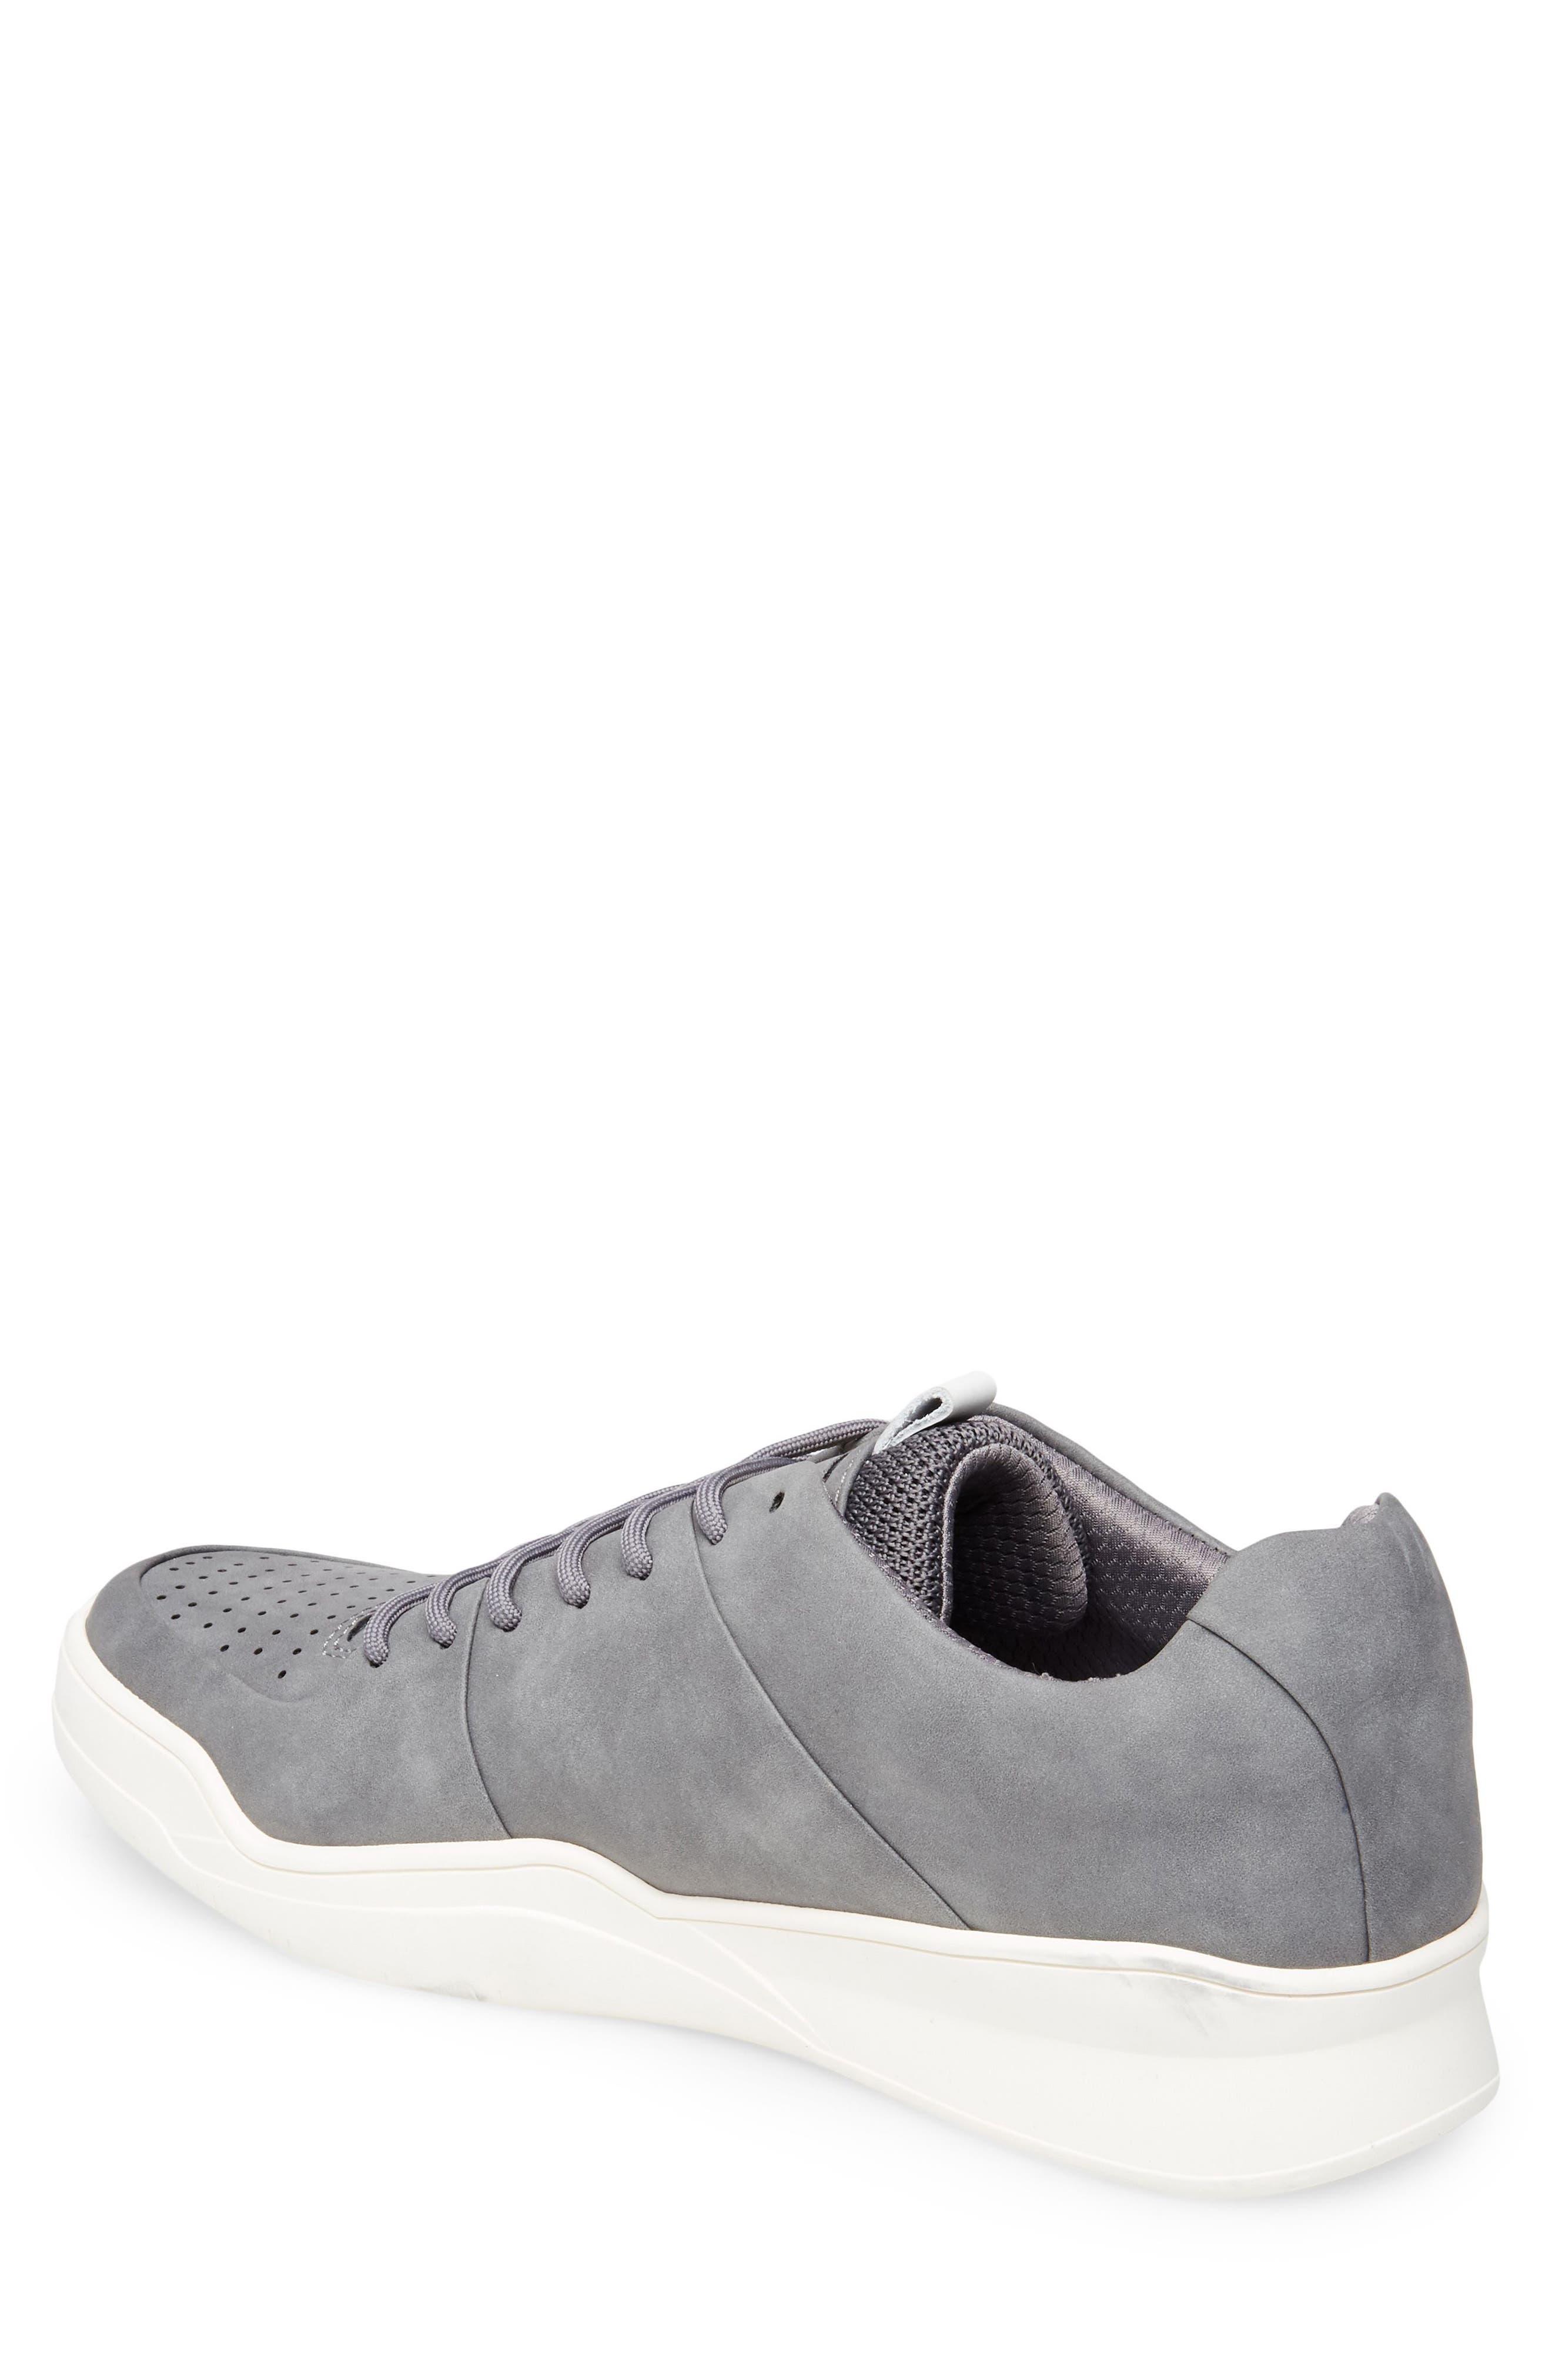 Vantage Sneaker,                             Alternate thumbnail 2, color,                             Grey